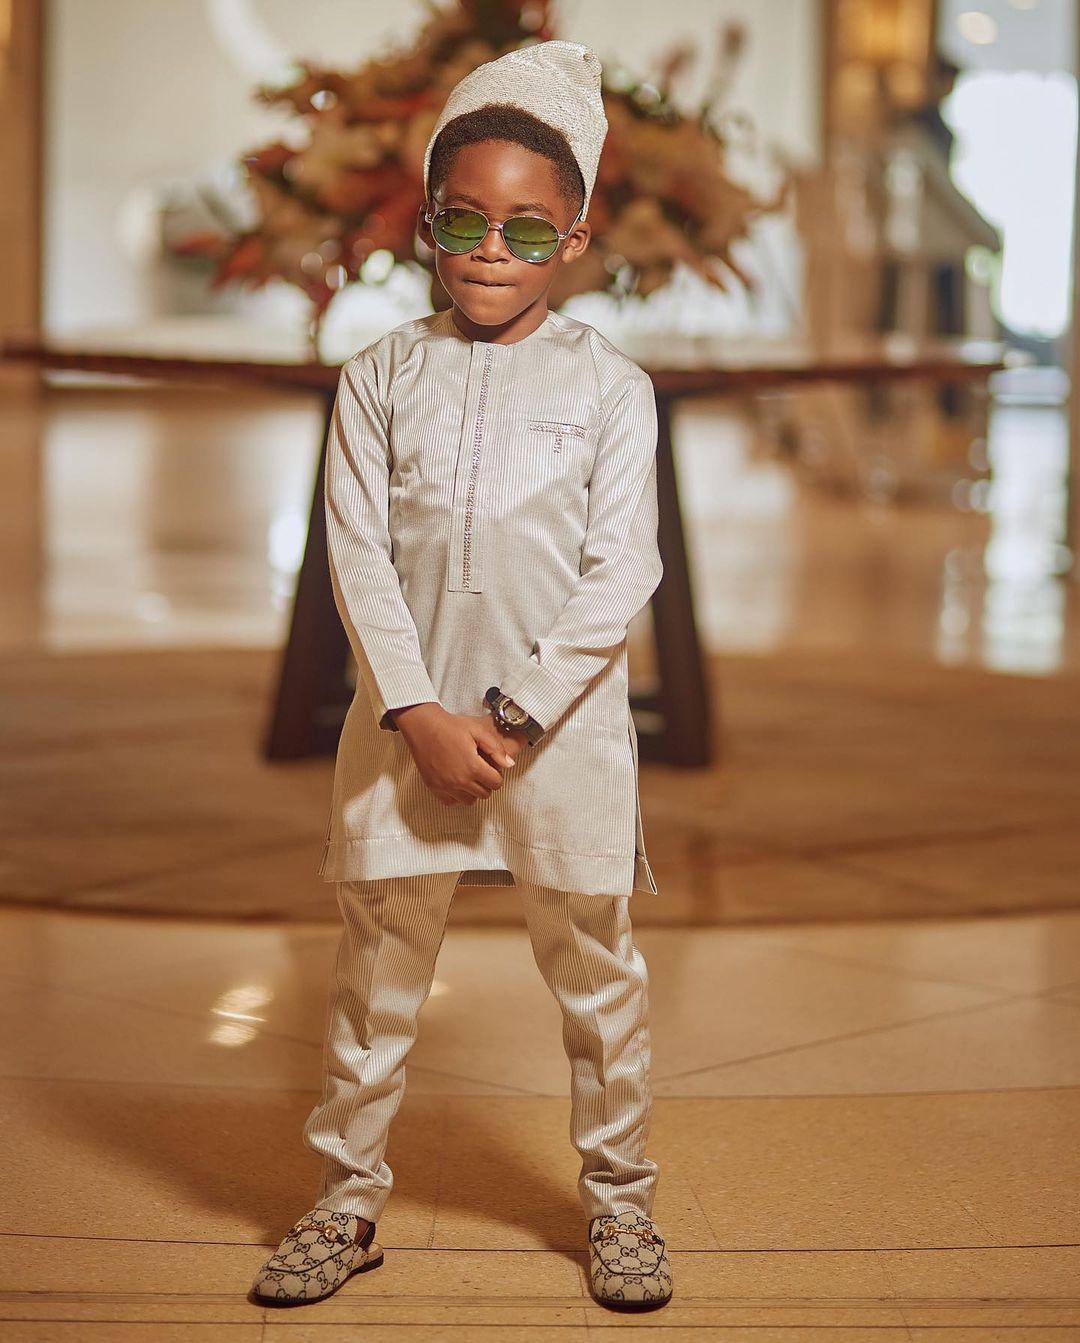 Tiwa Savage's son Jamal